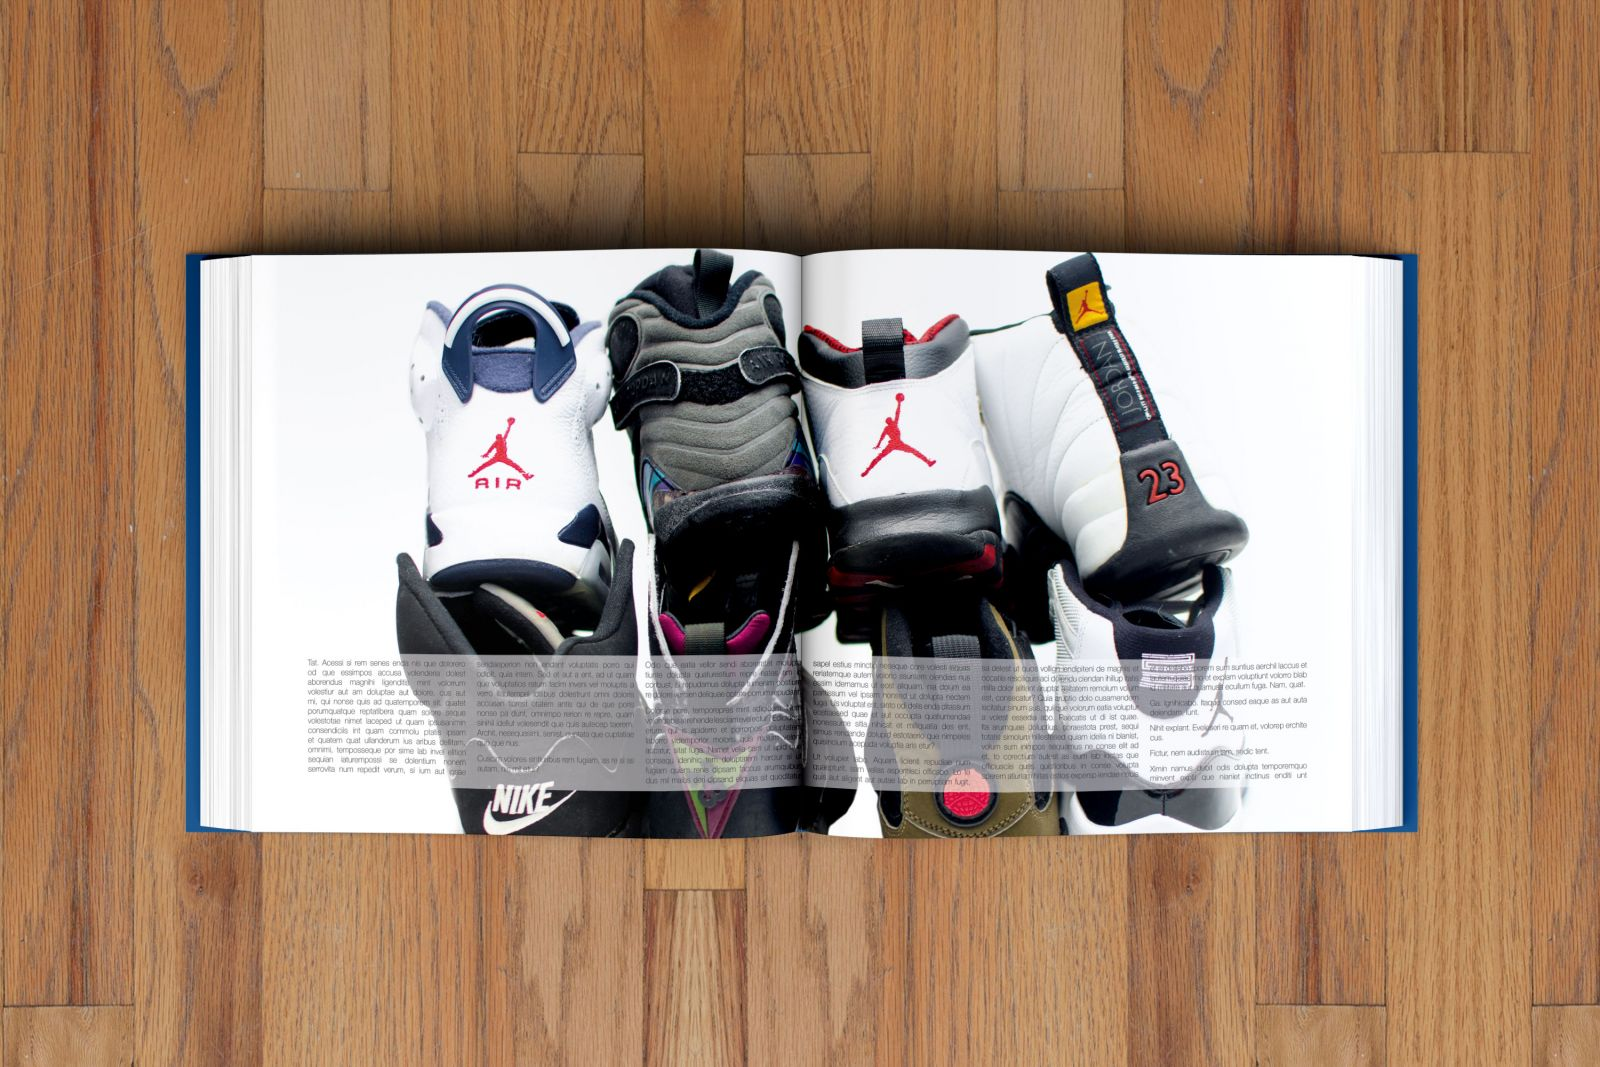 jordan shoes at kickstarter scam news 760822